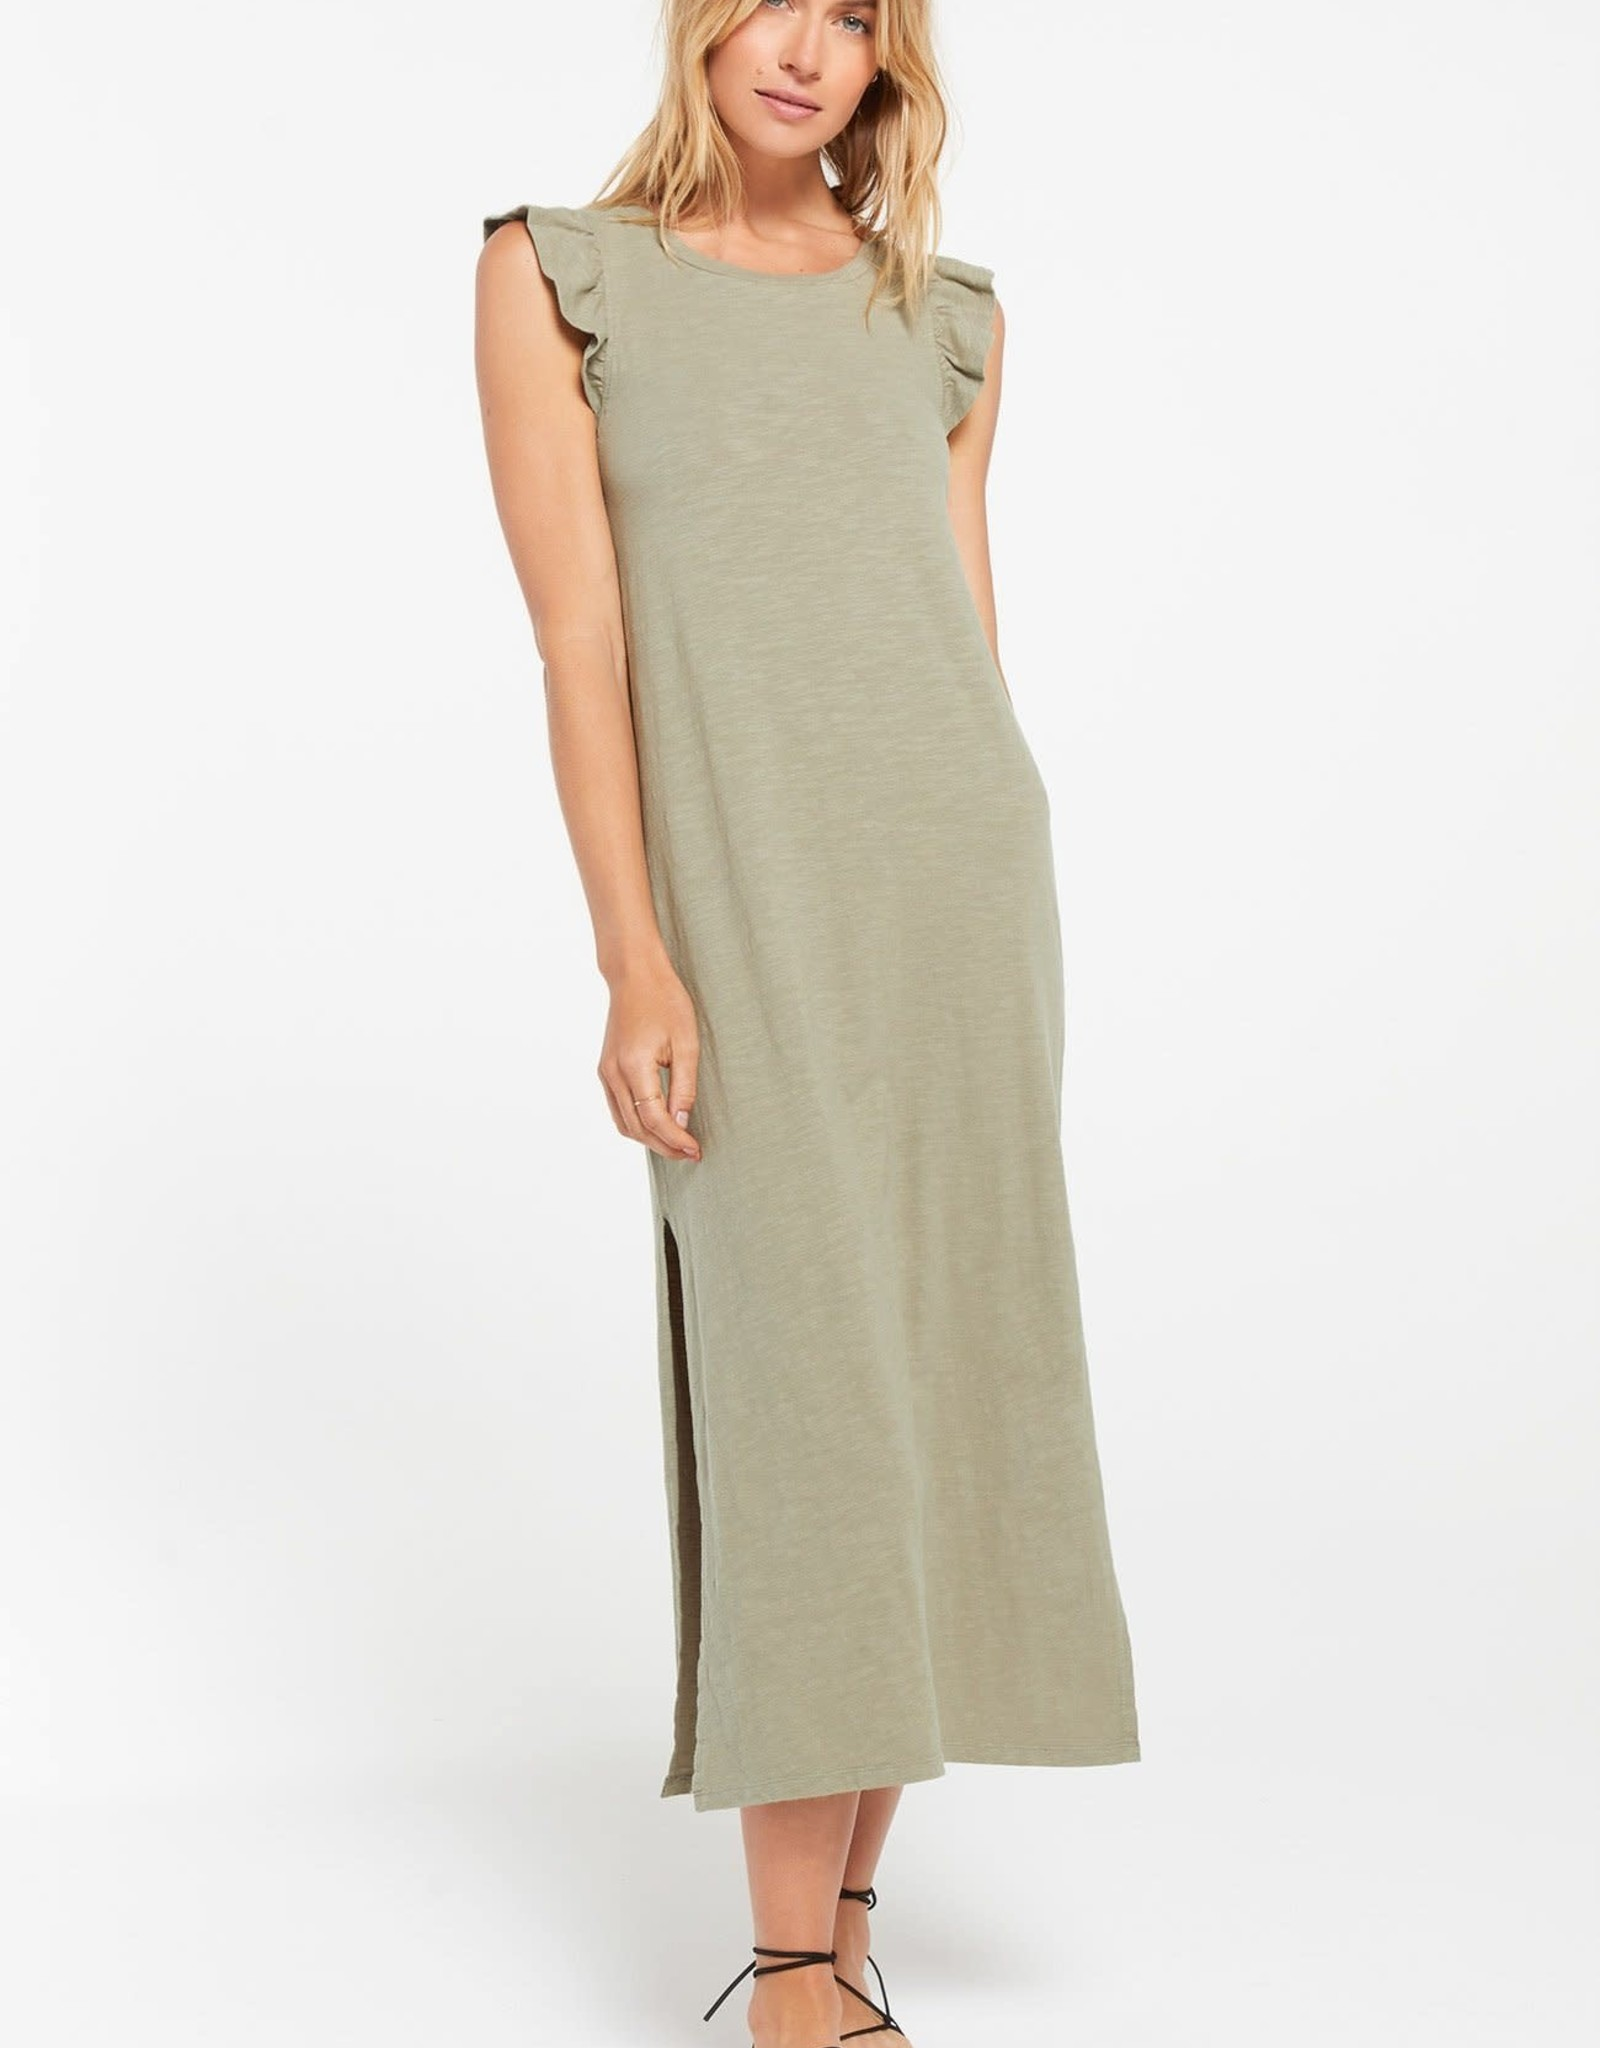 Z Supply Z Supply Blakely Ruffle Dress